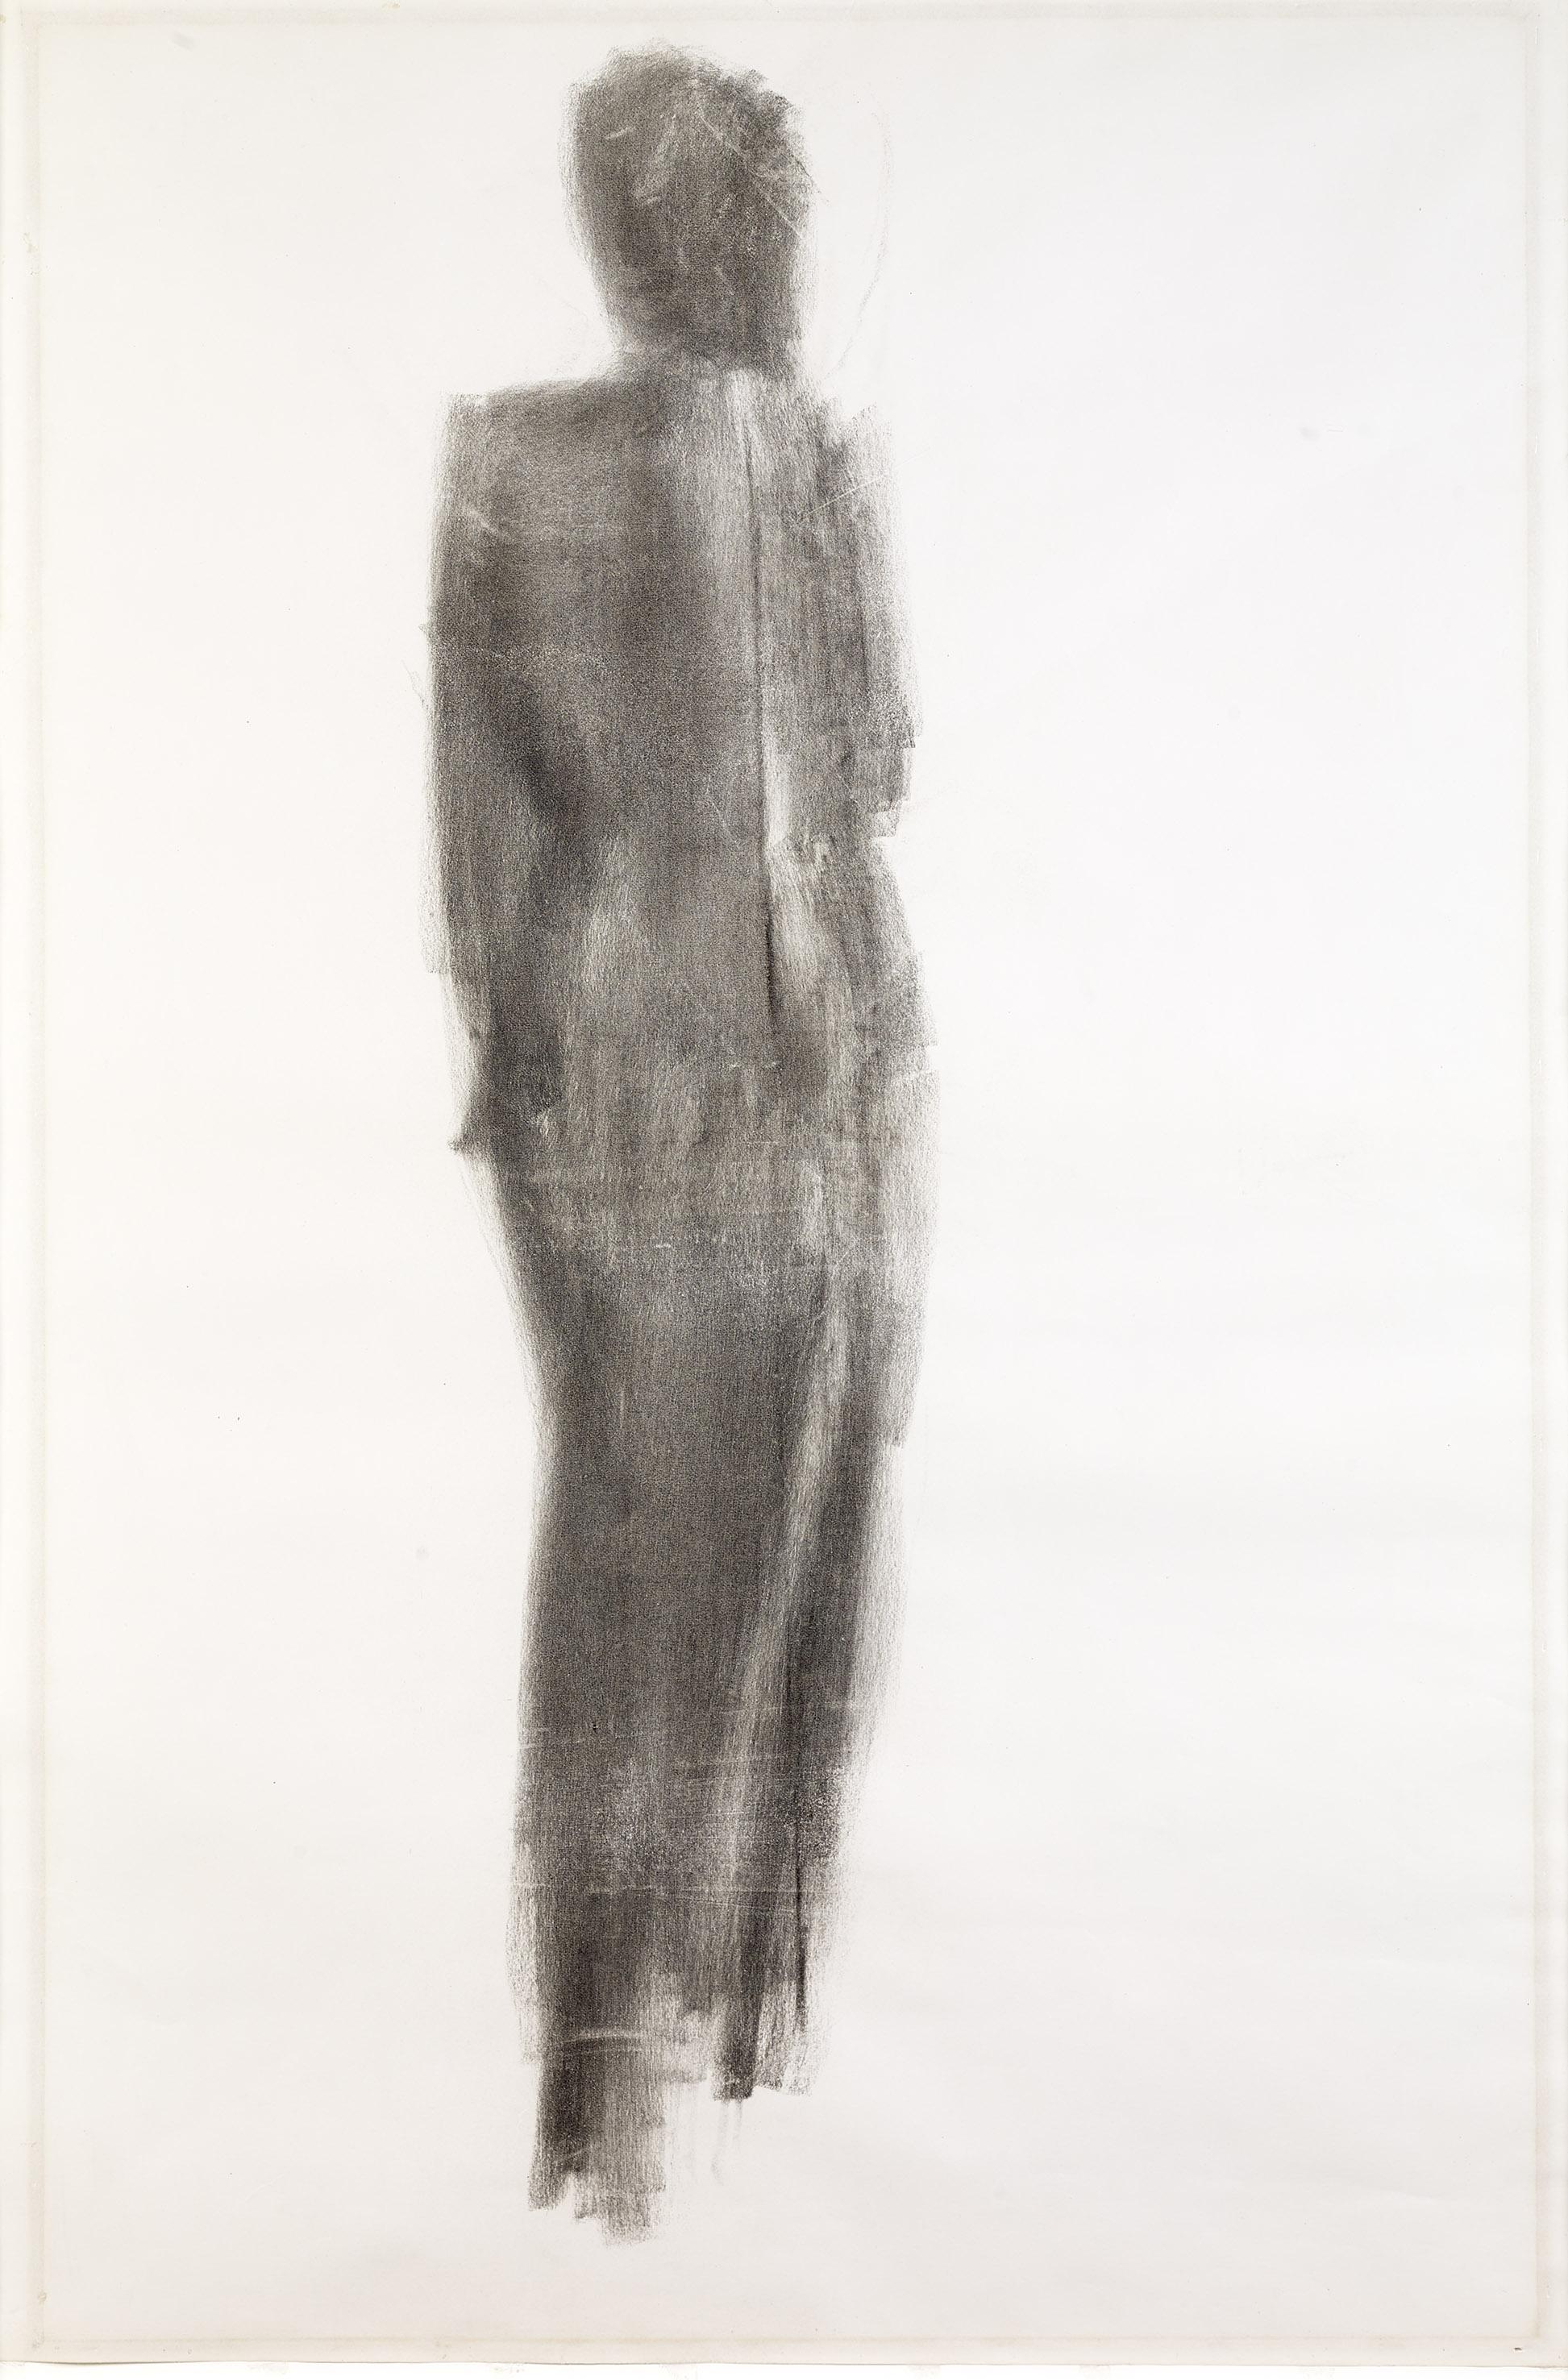 Etude de nu  (1955)  Nicolas de Staël  Photo : Claude Germain  Archives Fondation Maeght  © Adagp Paris 2016.